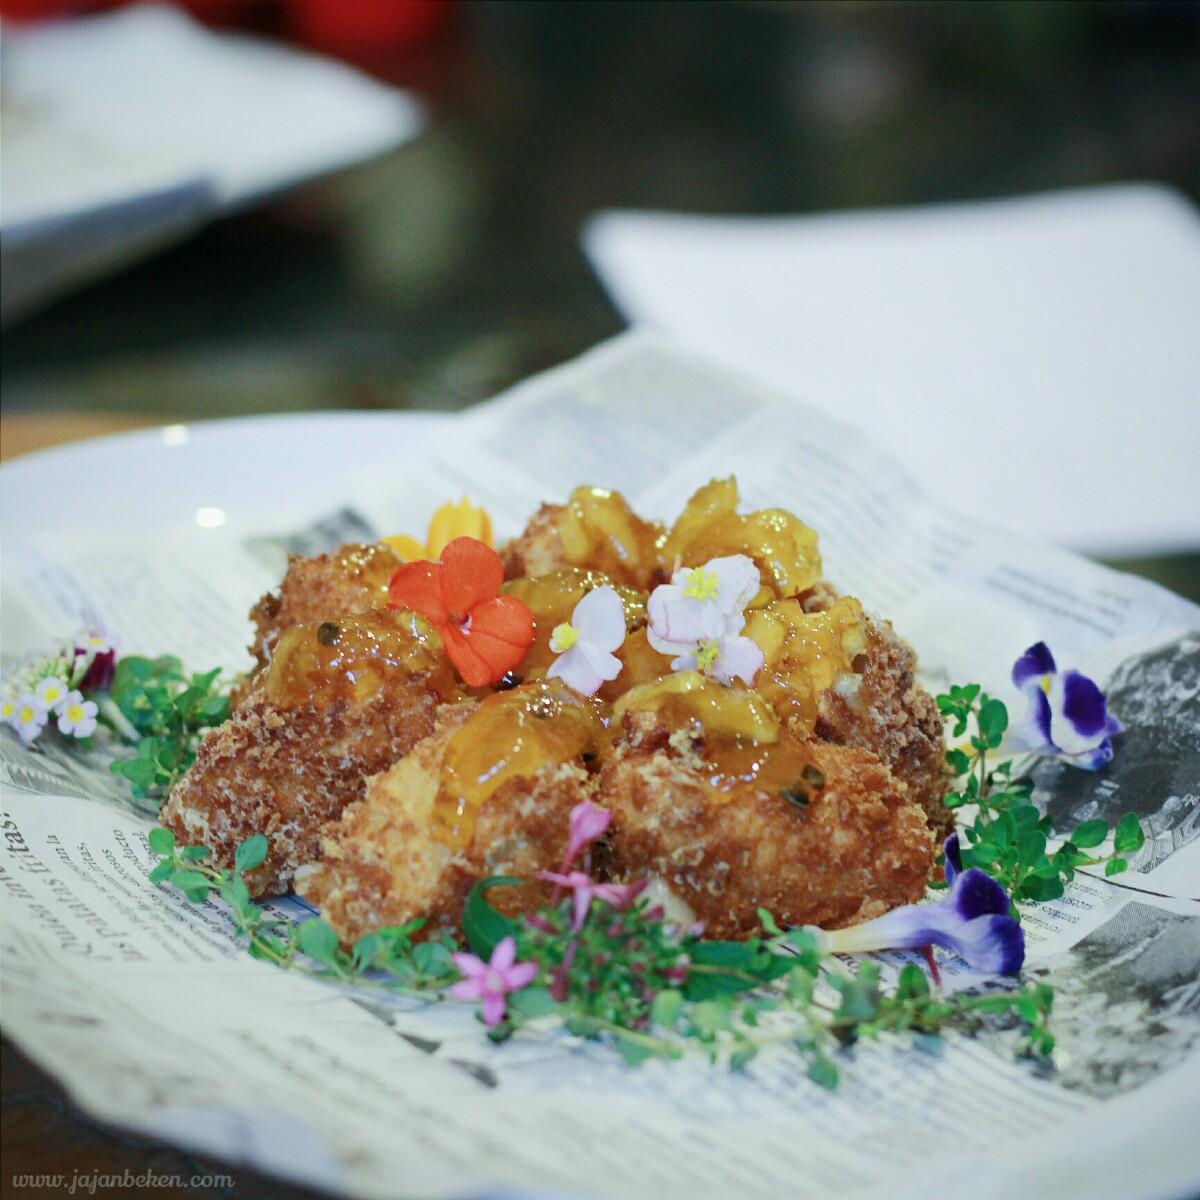 jajanbeken-greenfields-camembert-cheese-chef-arimbi-nimpuno-3.jpg.jpeg